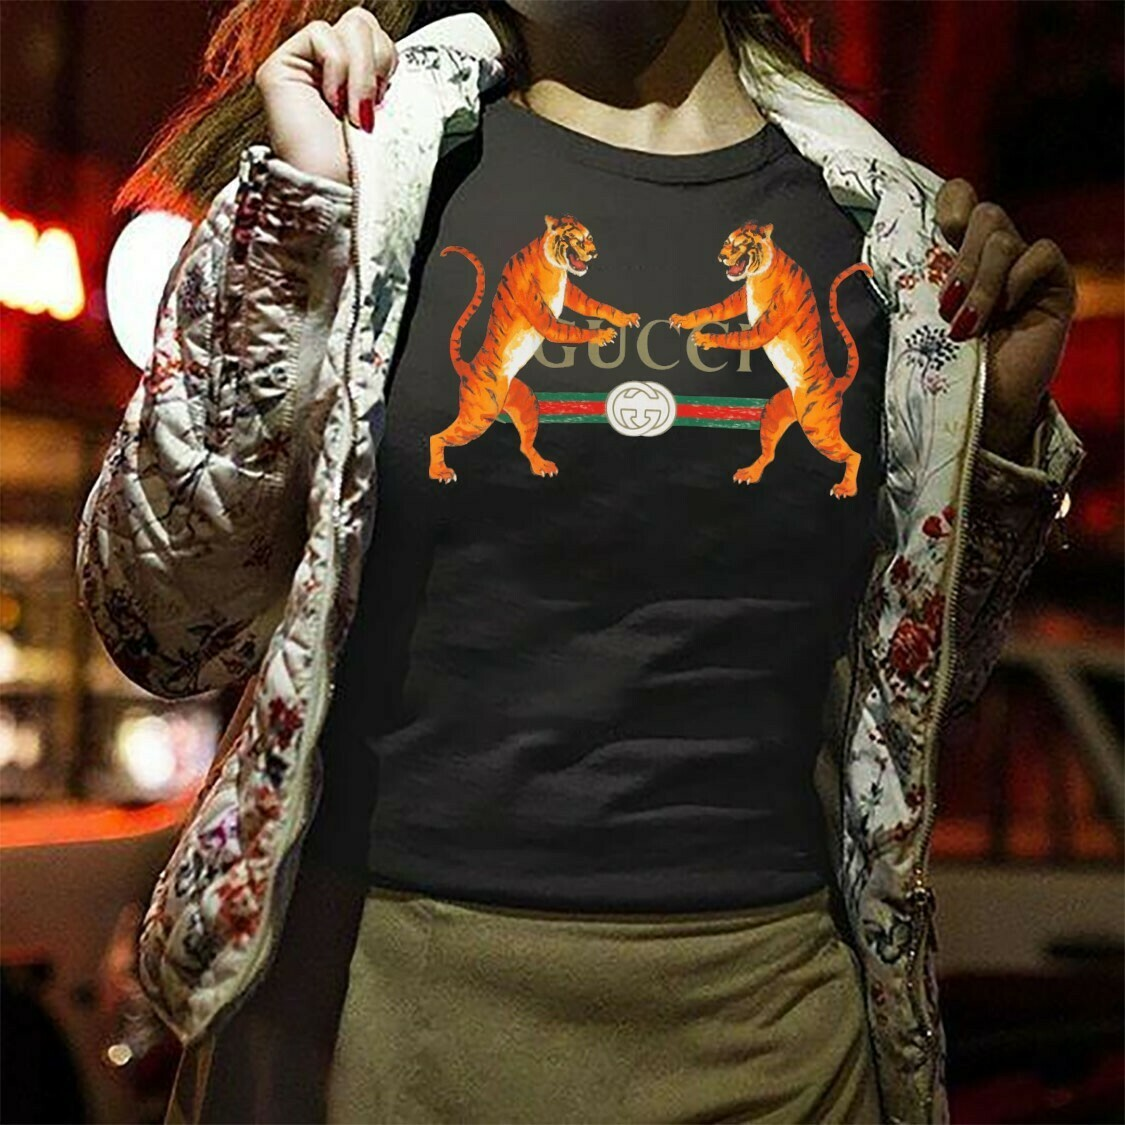 Classic Logo Tiger Gucci Chanel Shirt LV T-shirt Louis Vuitton Fashion LV Fashion for Women Men Youth Kids Vintage T Shirt Long Sleeve Sweatshirt Hoodie Jolly Family Gifts